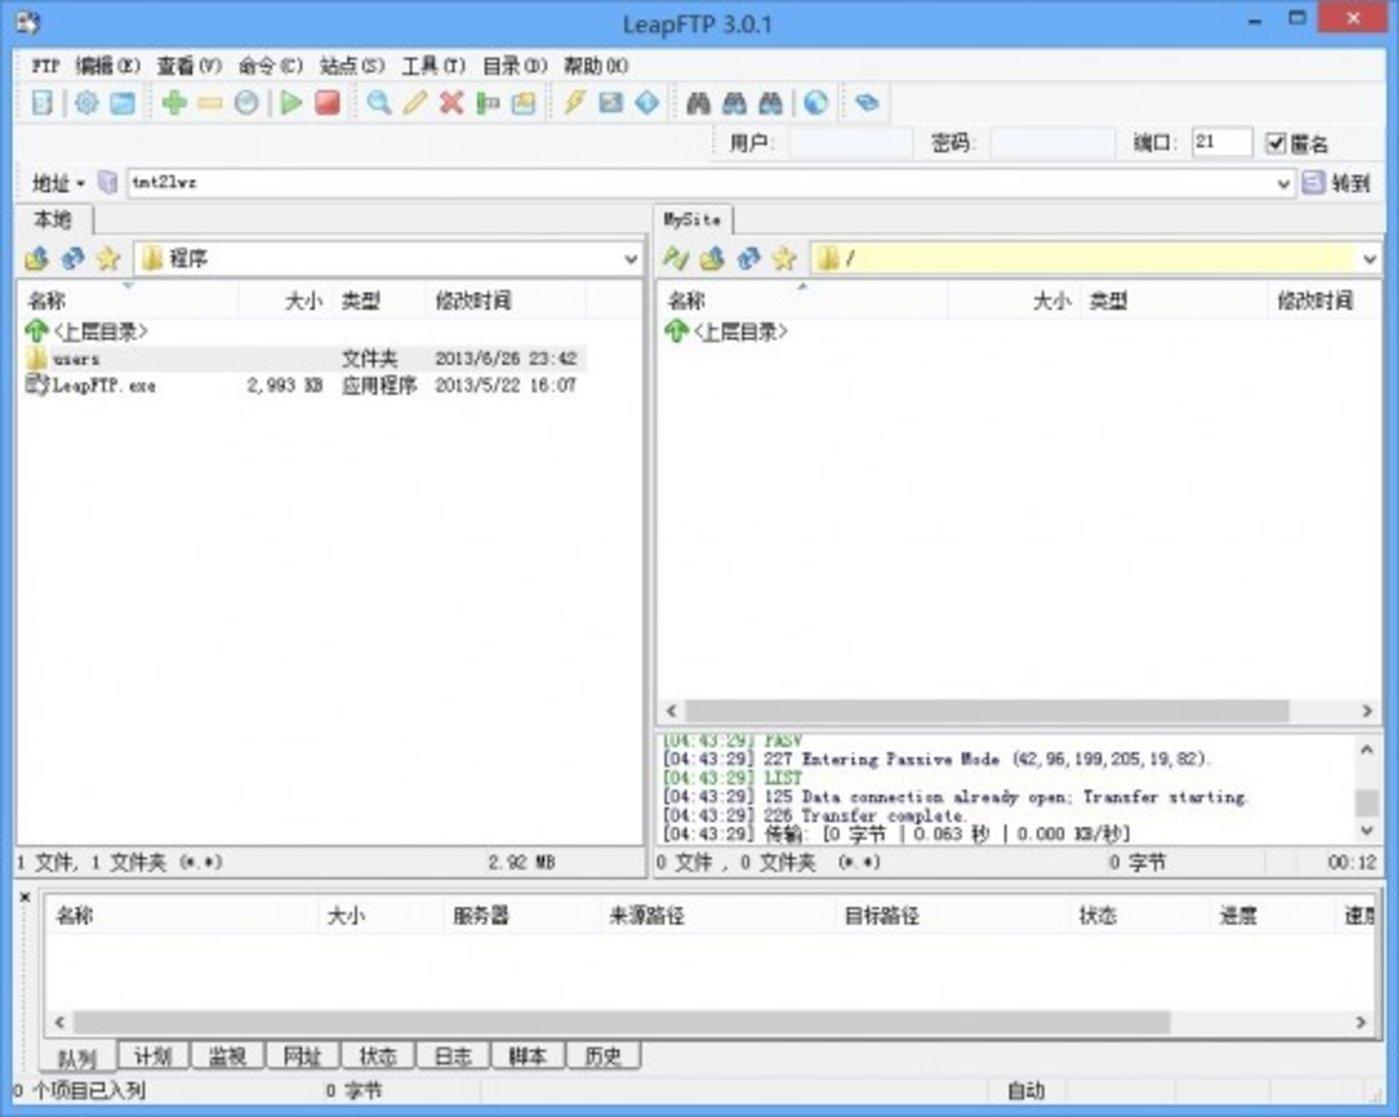 ftp软件连接后界面